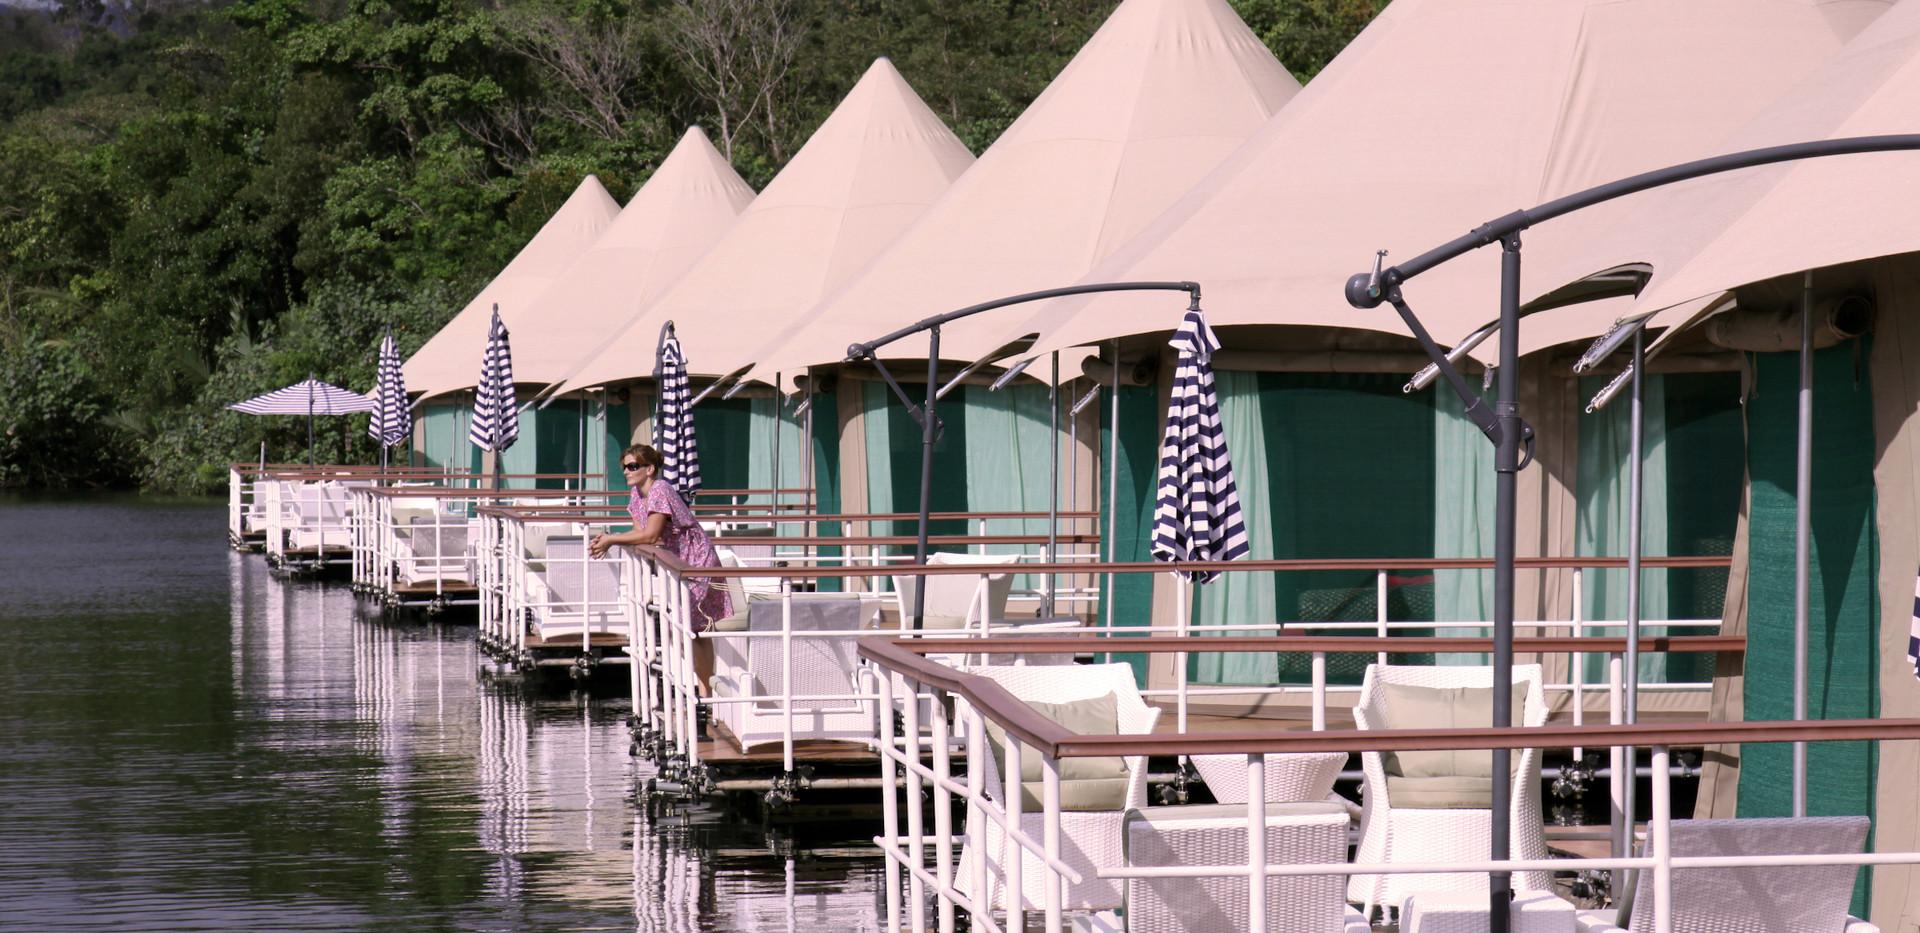 Thailand Yoga Holidays Destination River Resort Floating Bungalows